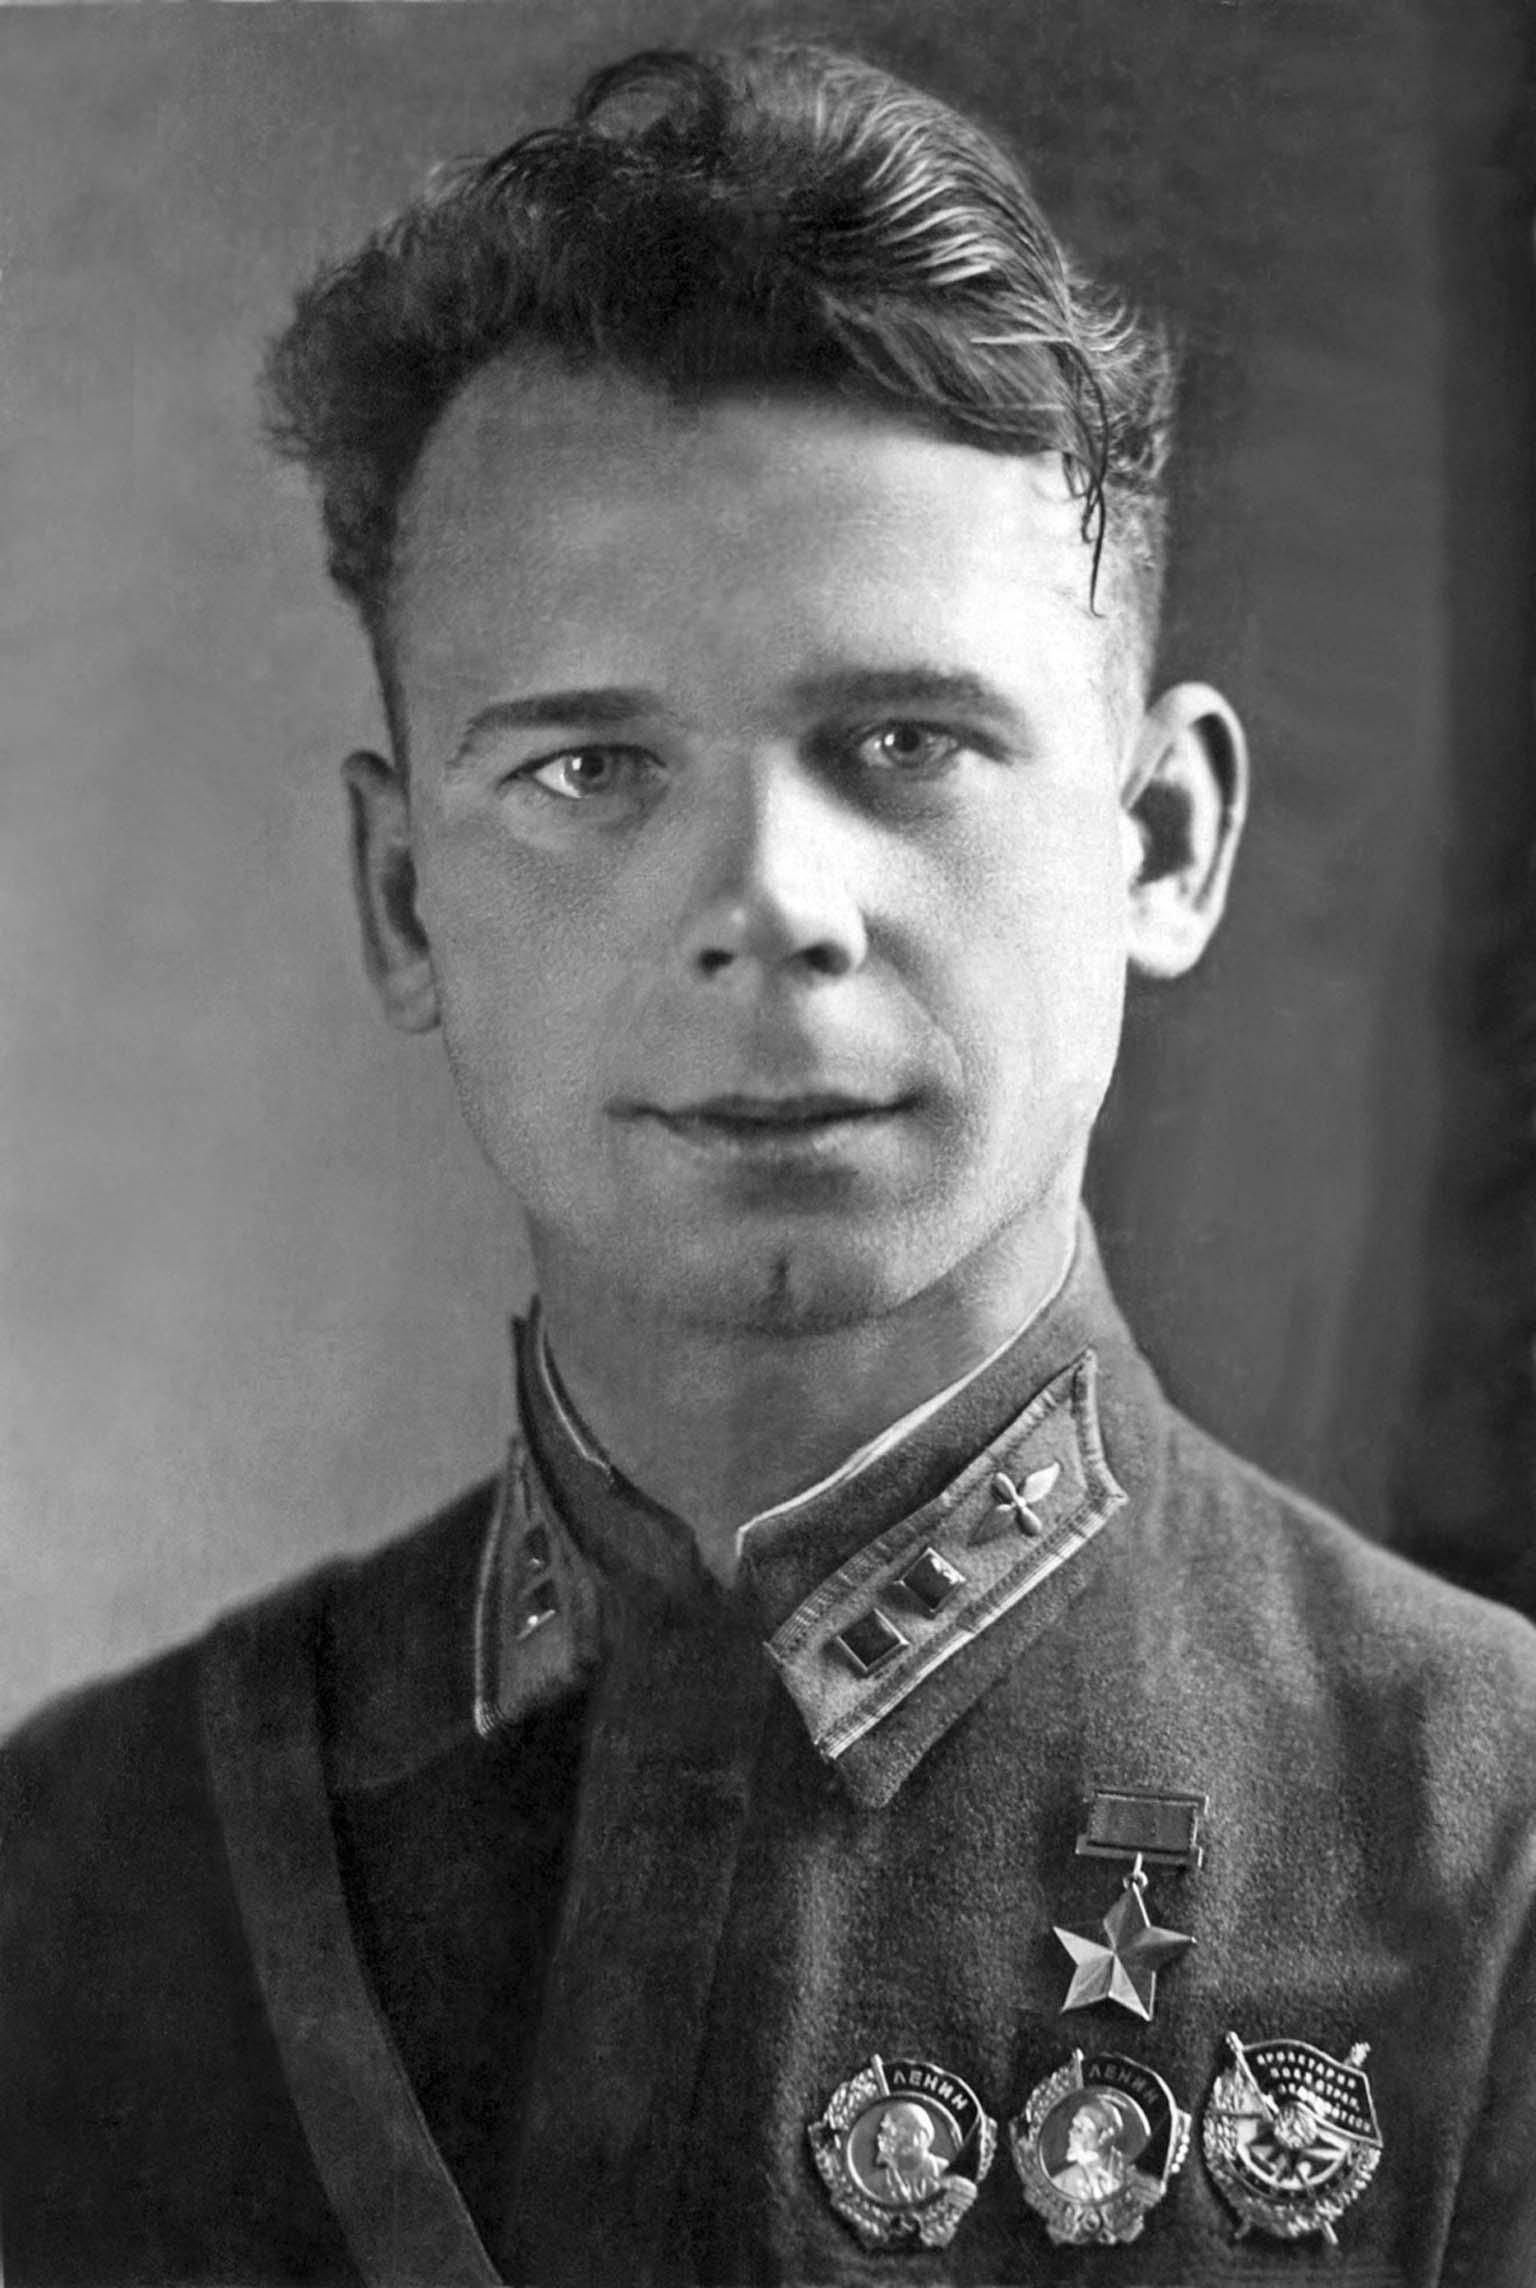 Philip Demchenkov